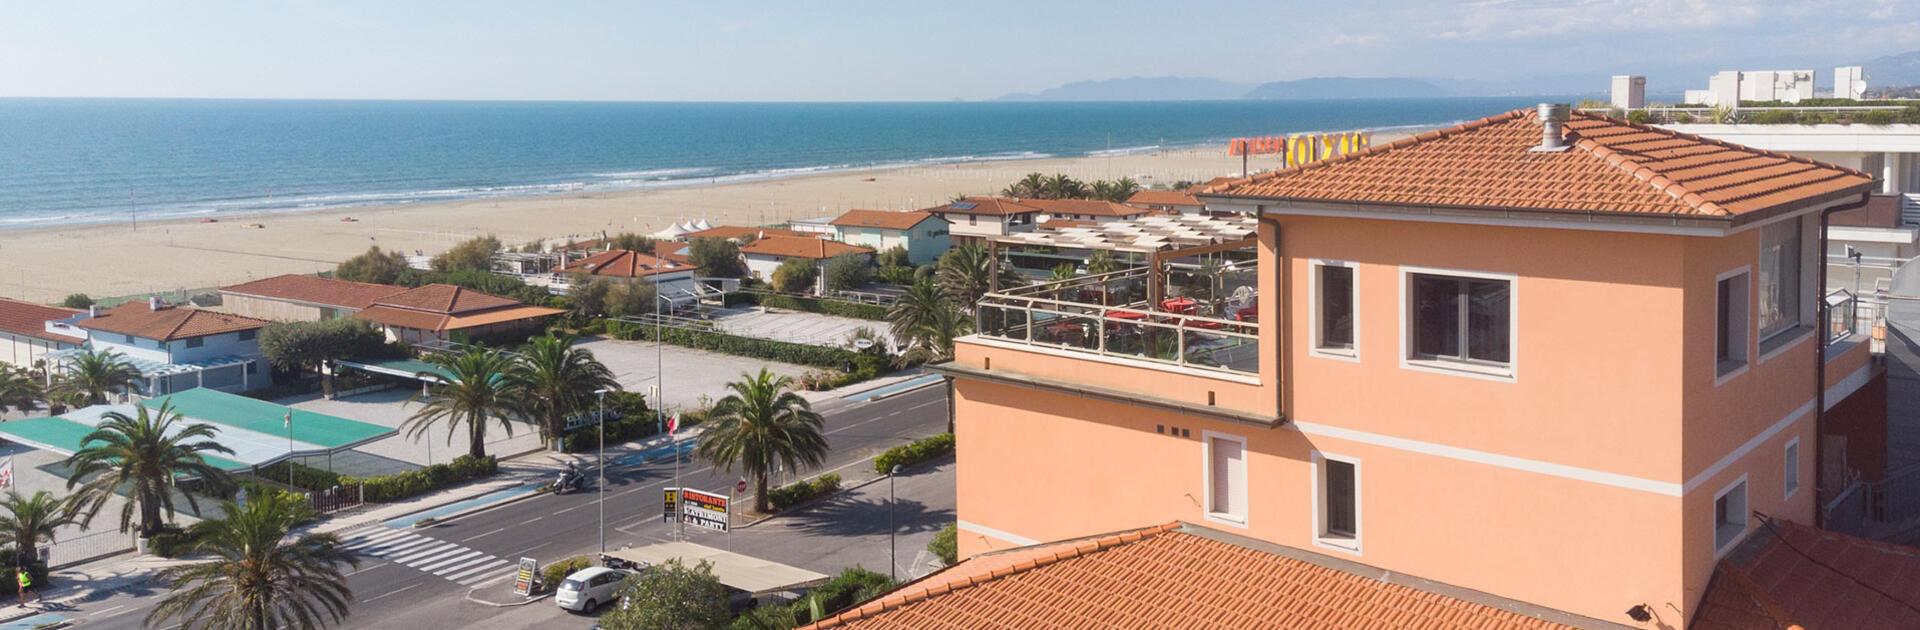 hotelbixio it bike-hotel-versilia 009